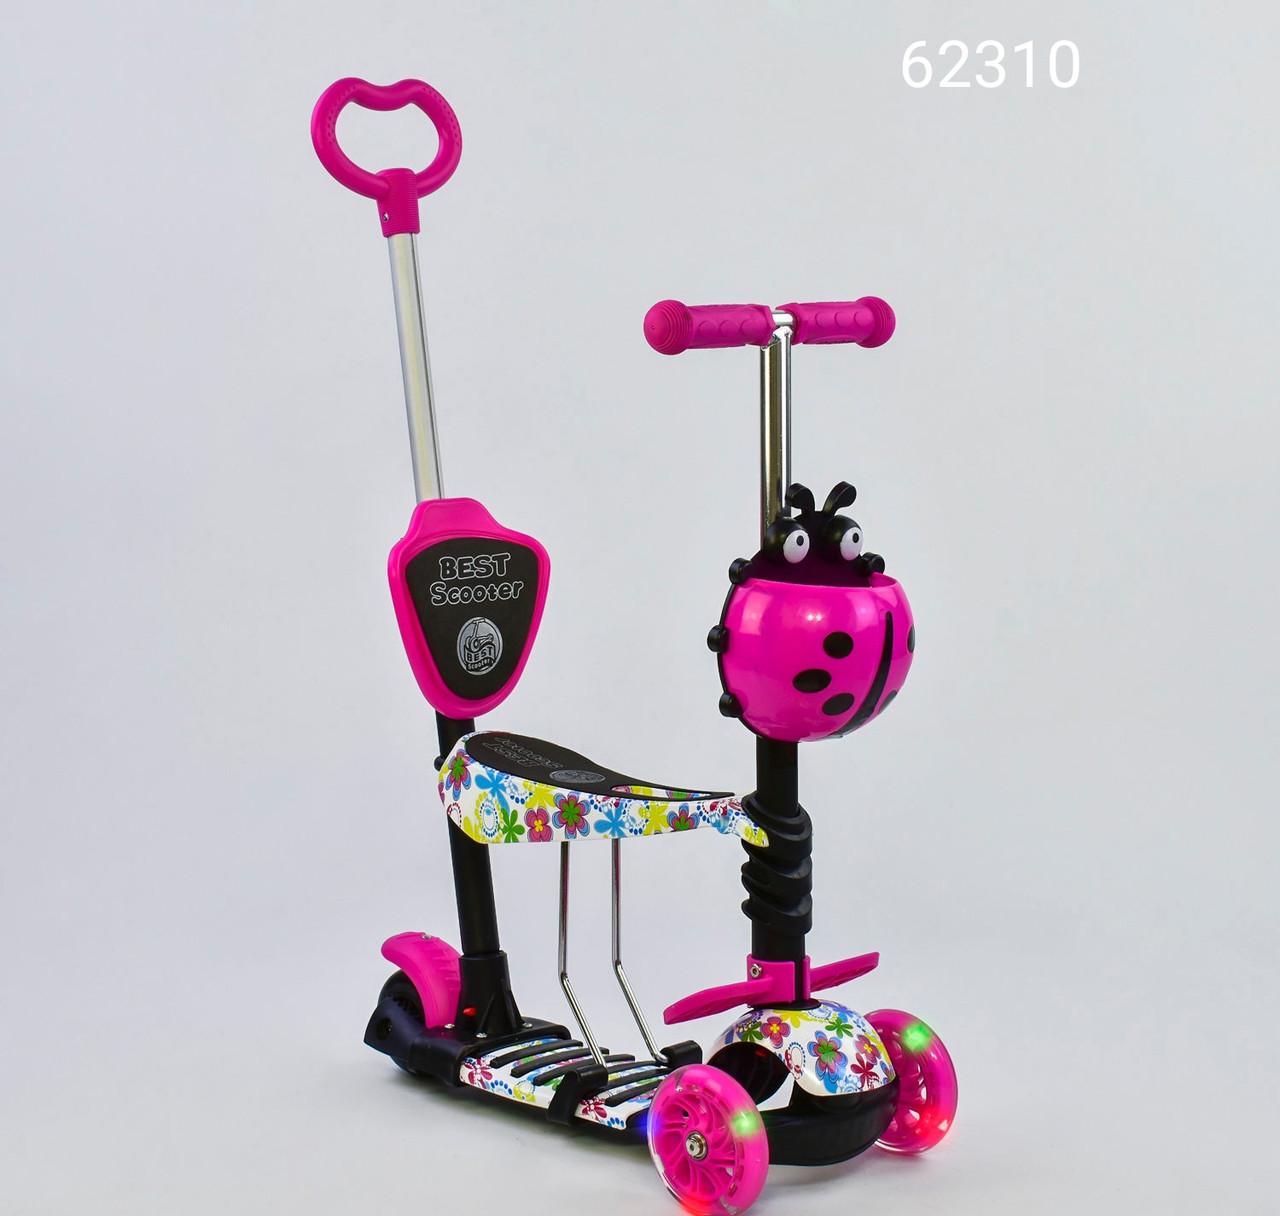 Самокат Best Scooter K 5 в 1 з ручкою 62310